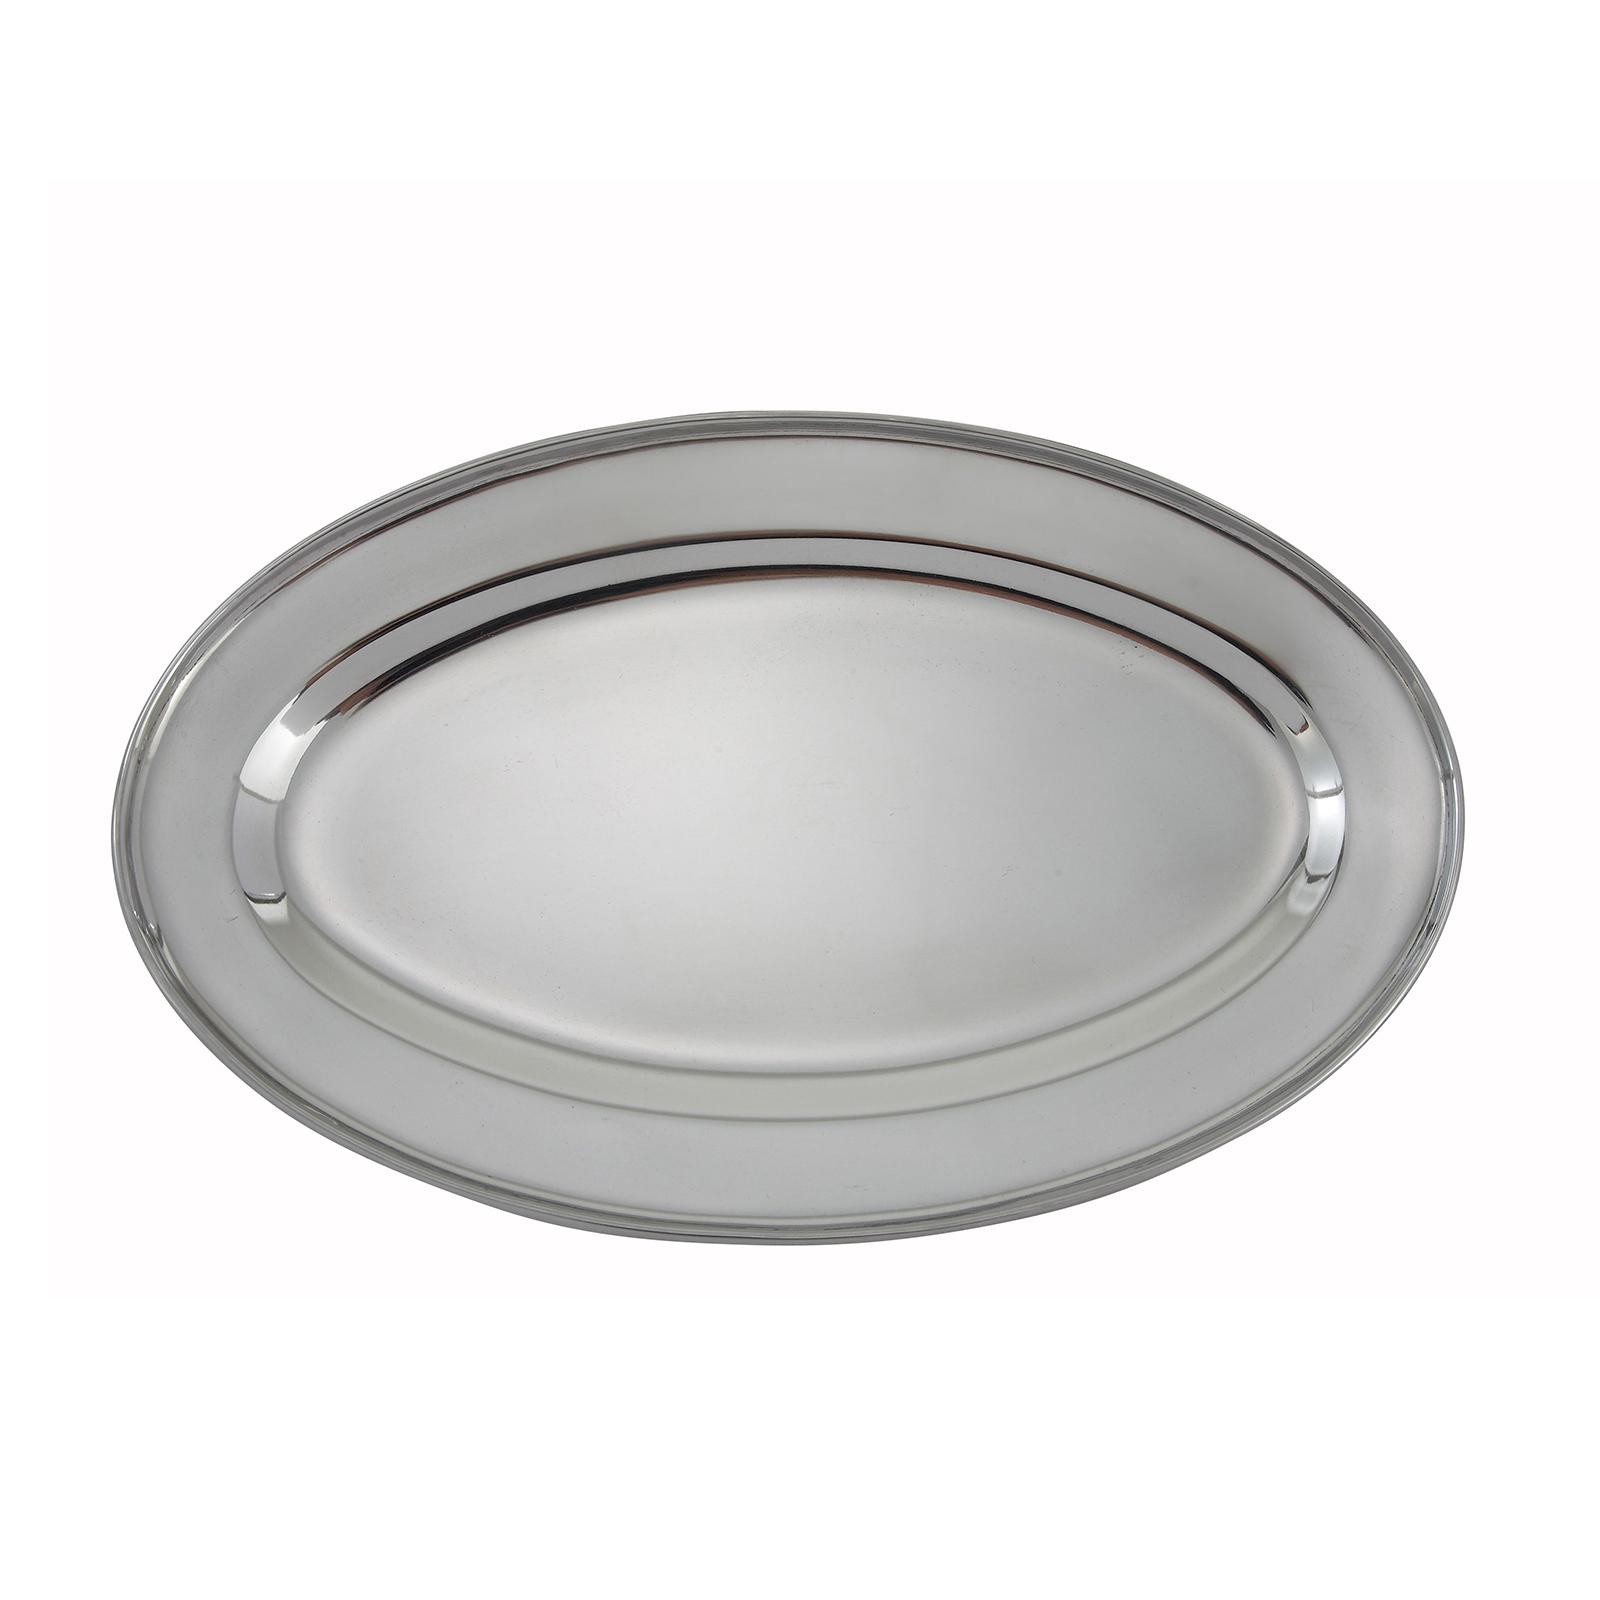 Winco OPL-12 platter, stainless steel